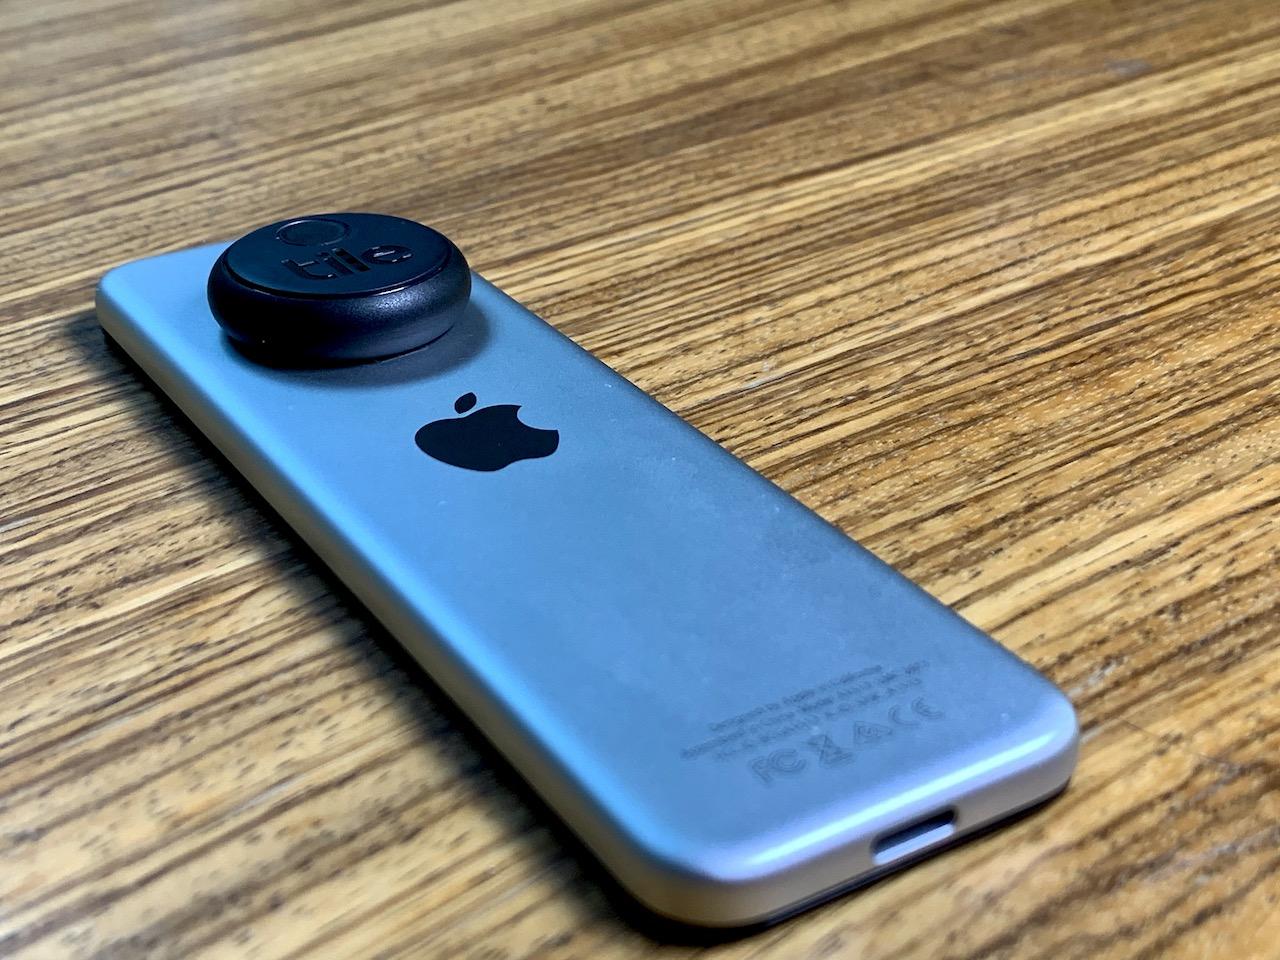 Tile Sticker op Apple TV Siri Remote.